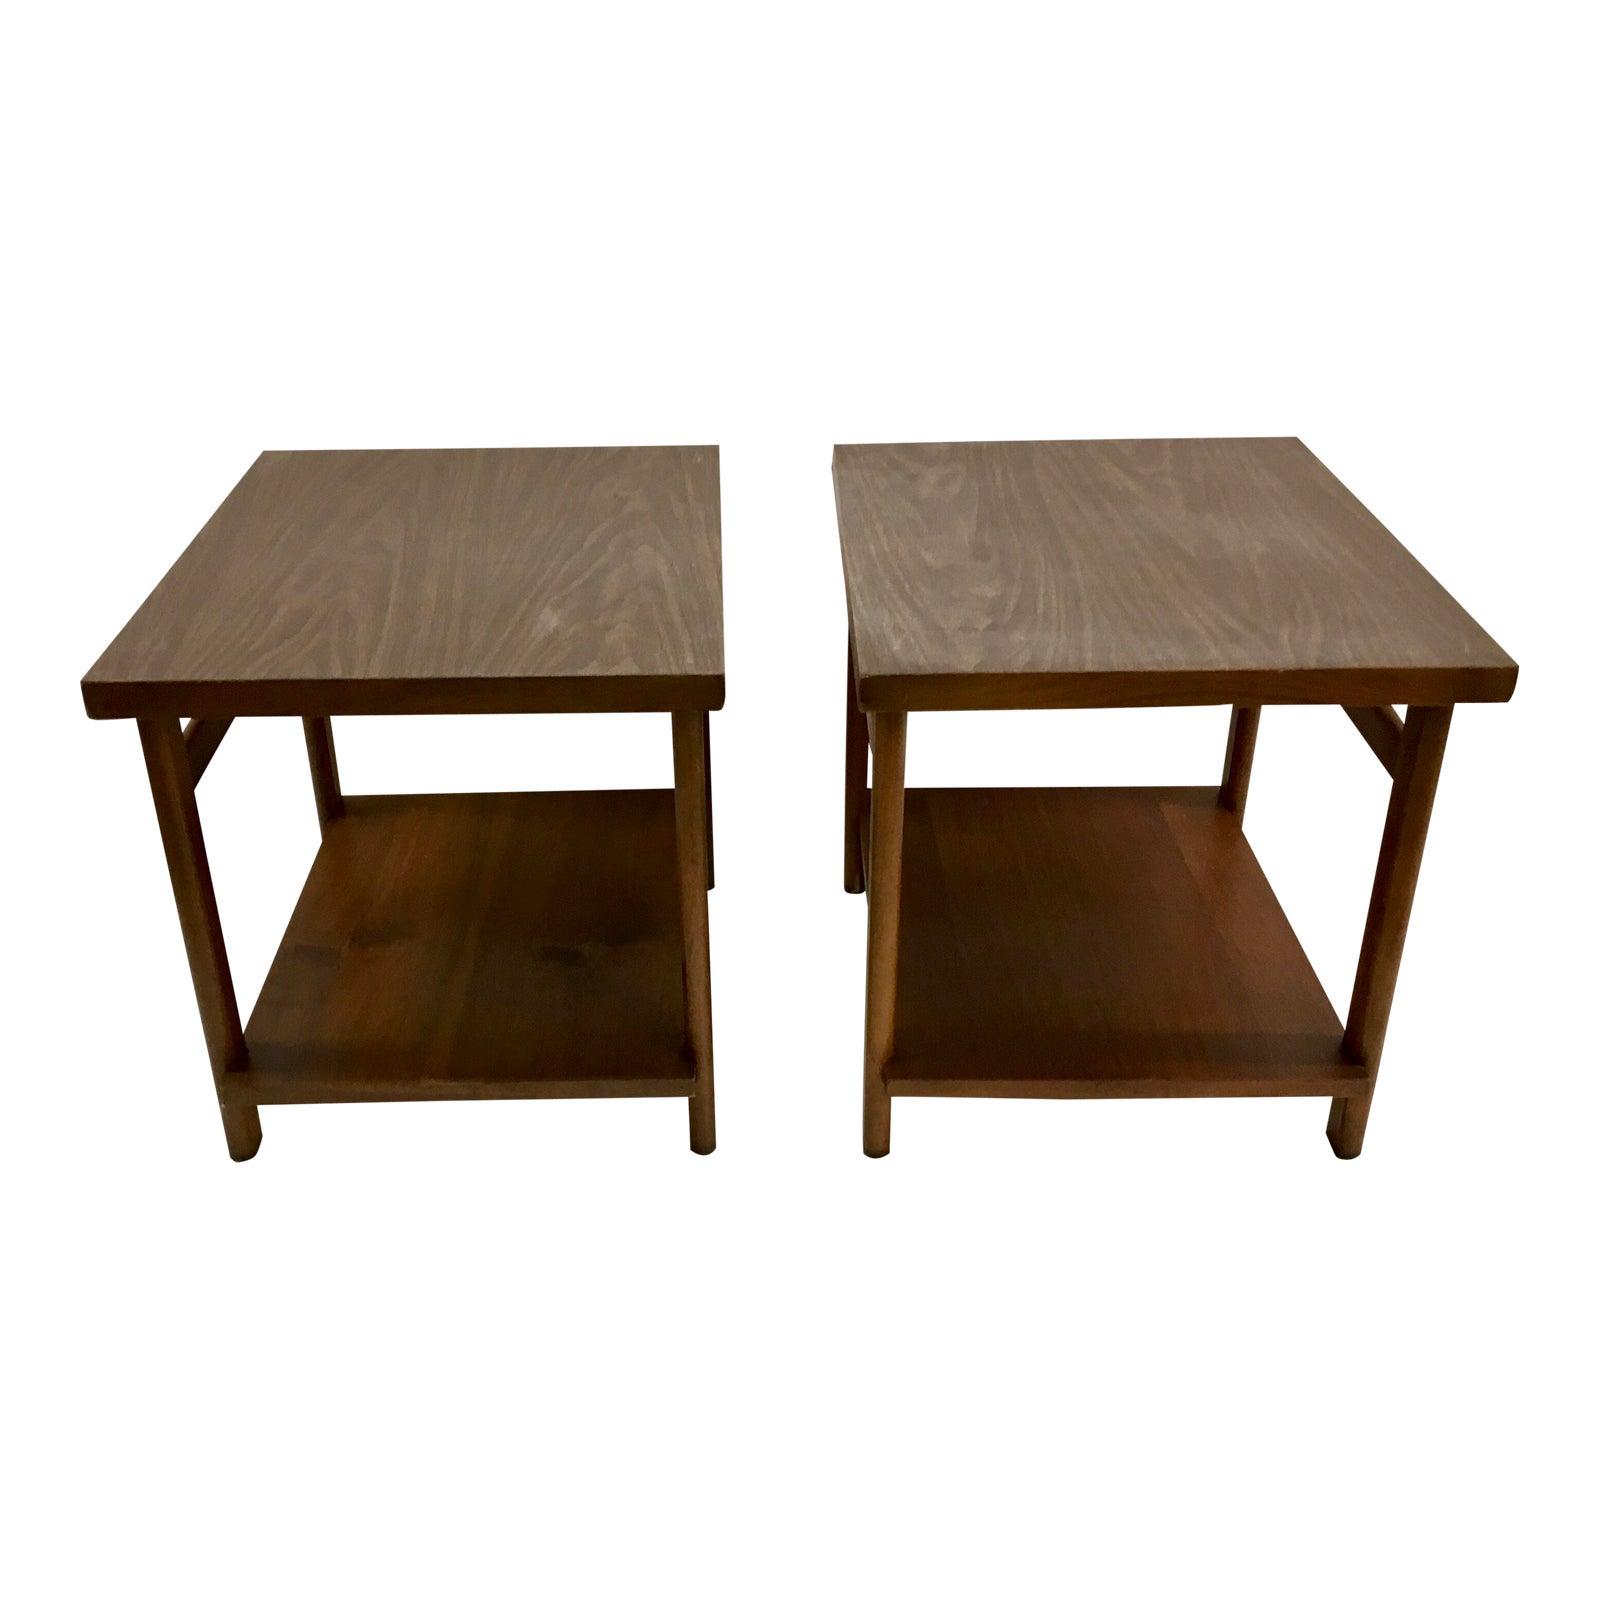 Mid Century Modern Furniture Virginia: Lane Mid-Century Modern Virginia Maid End Tables